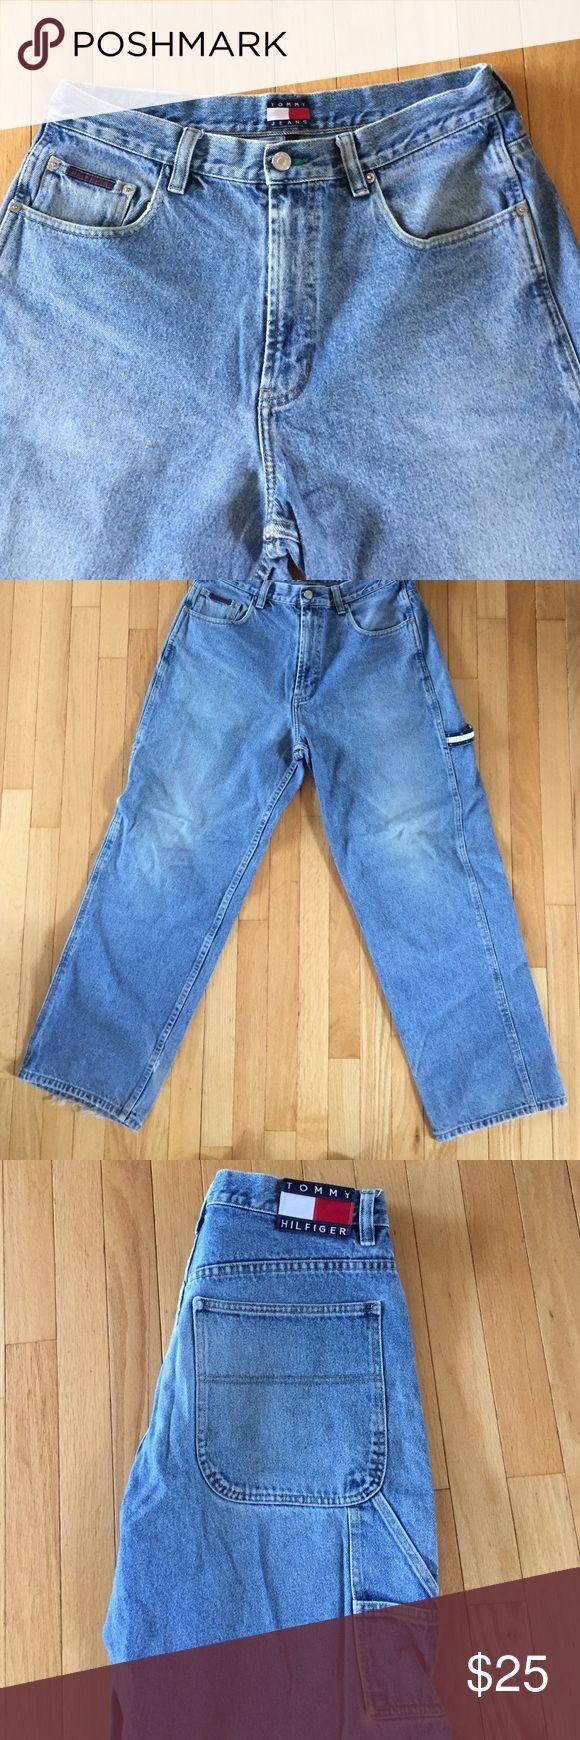 Men's Tommy Hilfiger jeans 33x32 Very good condition, sharp looking. Tommy Hilfiger Jeans